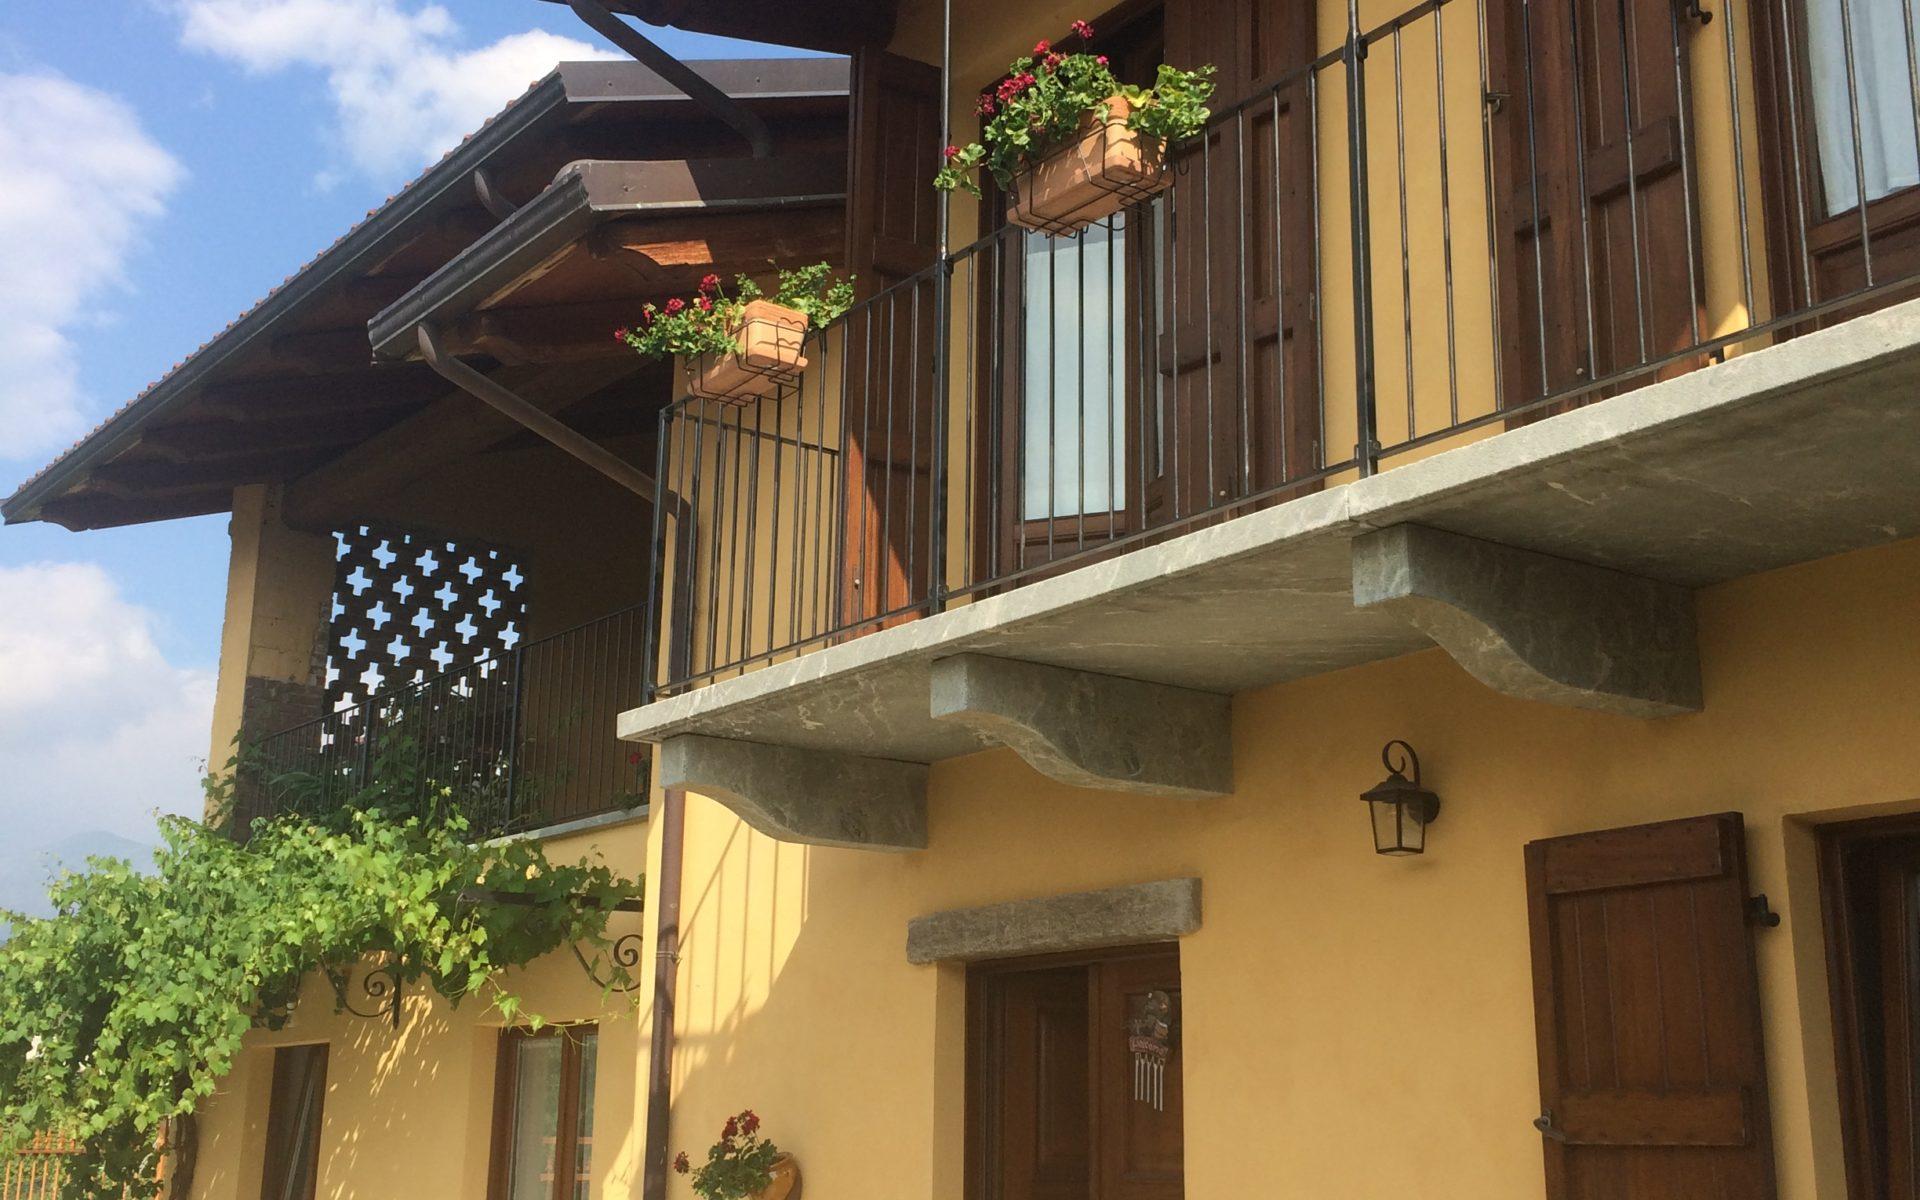 La-Bonauda-affittacamere-Canavese